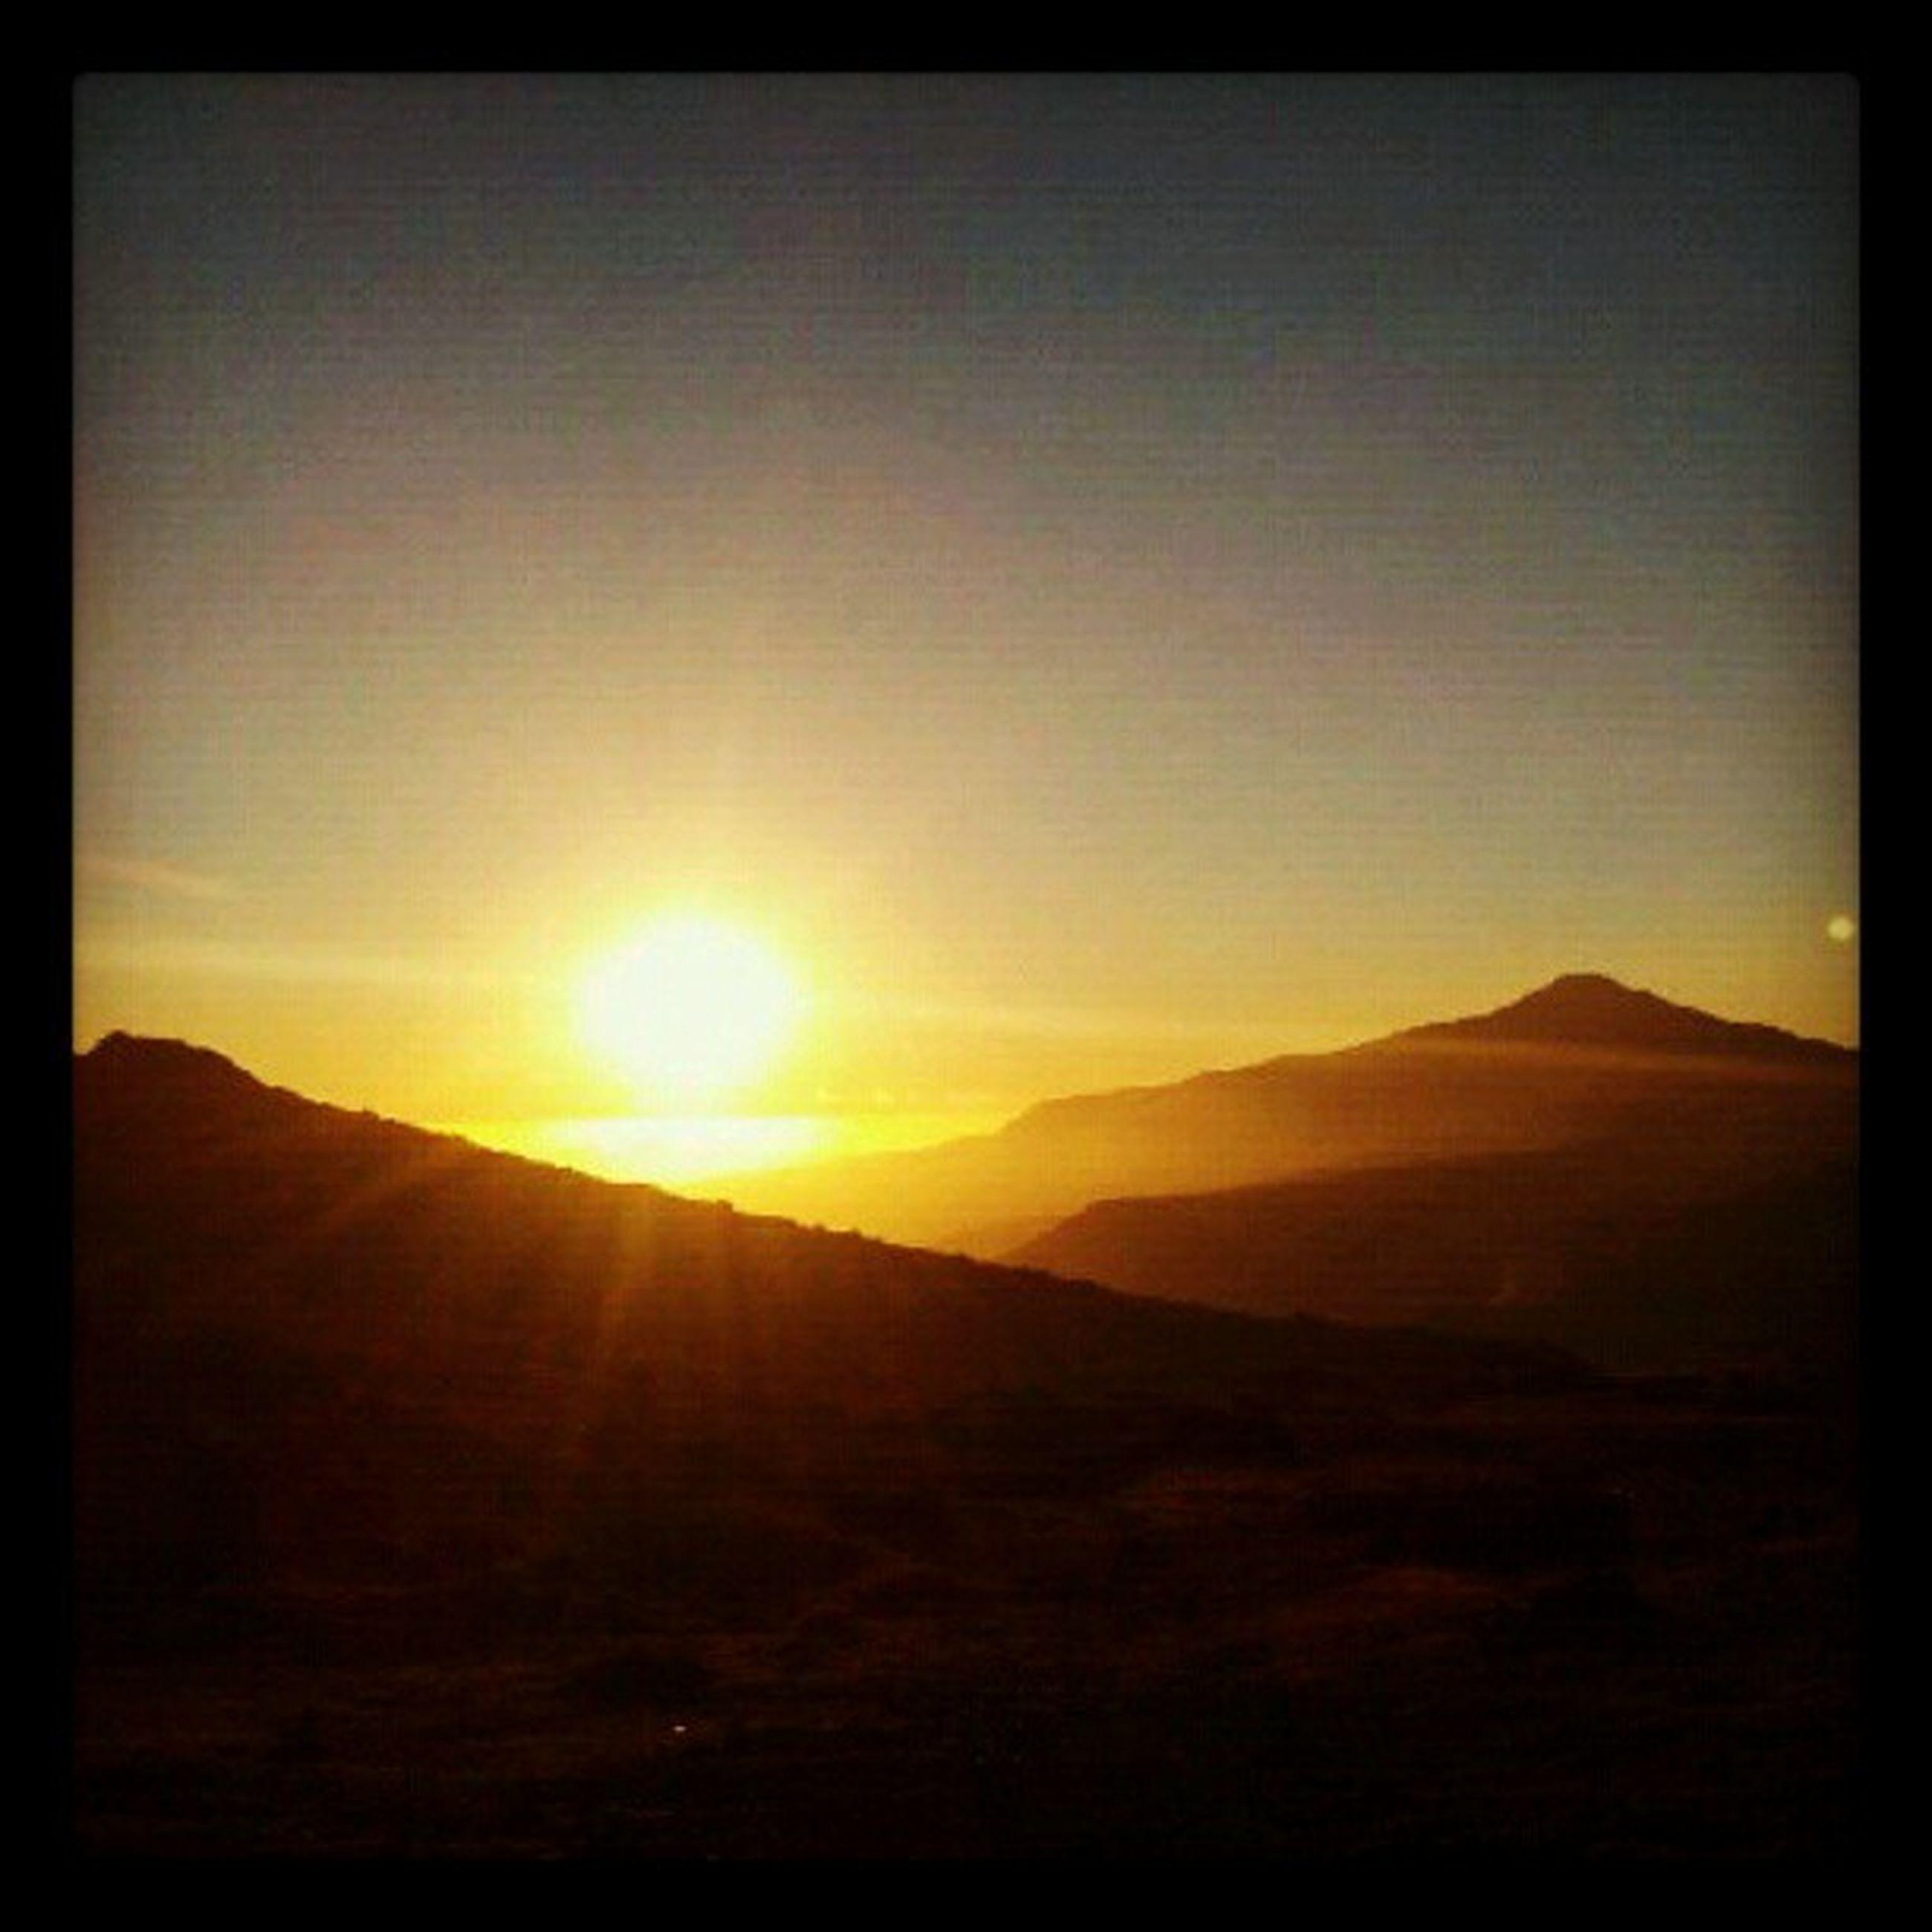 sun, tranquil scene, tranquility, scenics, sunset, landscape, beauty in nature, sunlight, mountain, nature, idyllic, clear sky, sunbeam, sky, non-urban scene, lens flare, remote, mountain range, silhouette, desert